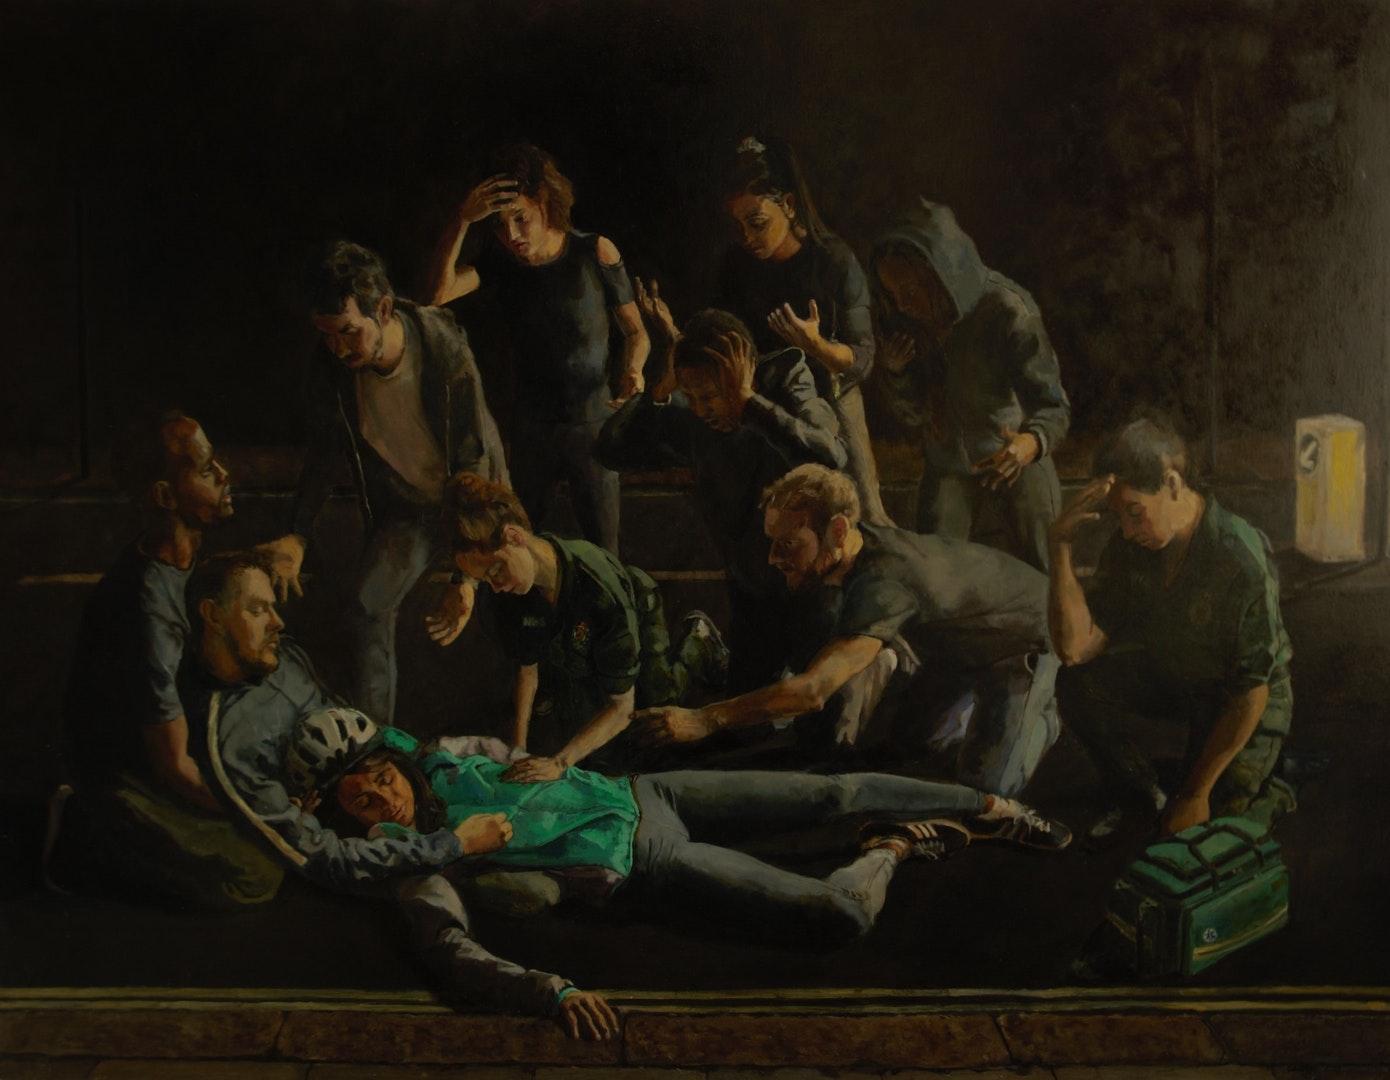 'The Death Of A Courier', Nicholas Baldion, Oil on gesso board, 78.5 x 103 cm